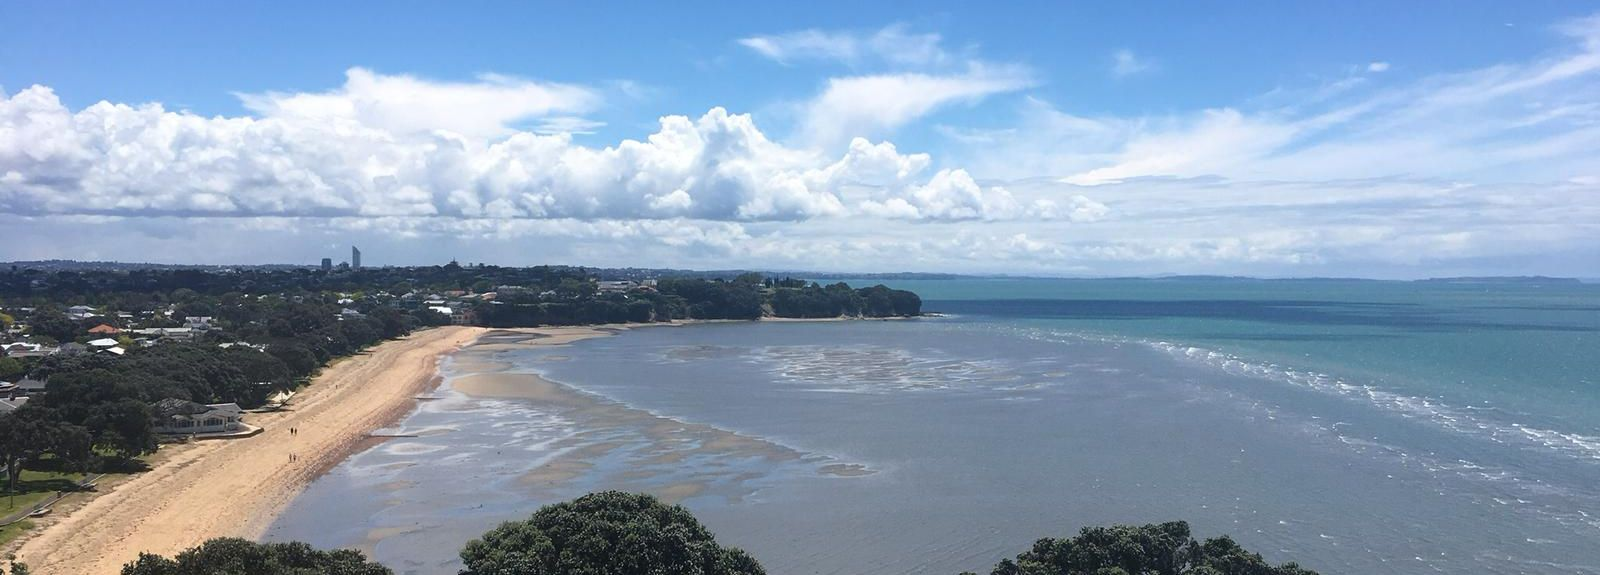 Devonport, Auckland Region, New Zealand